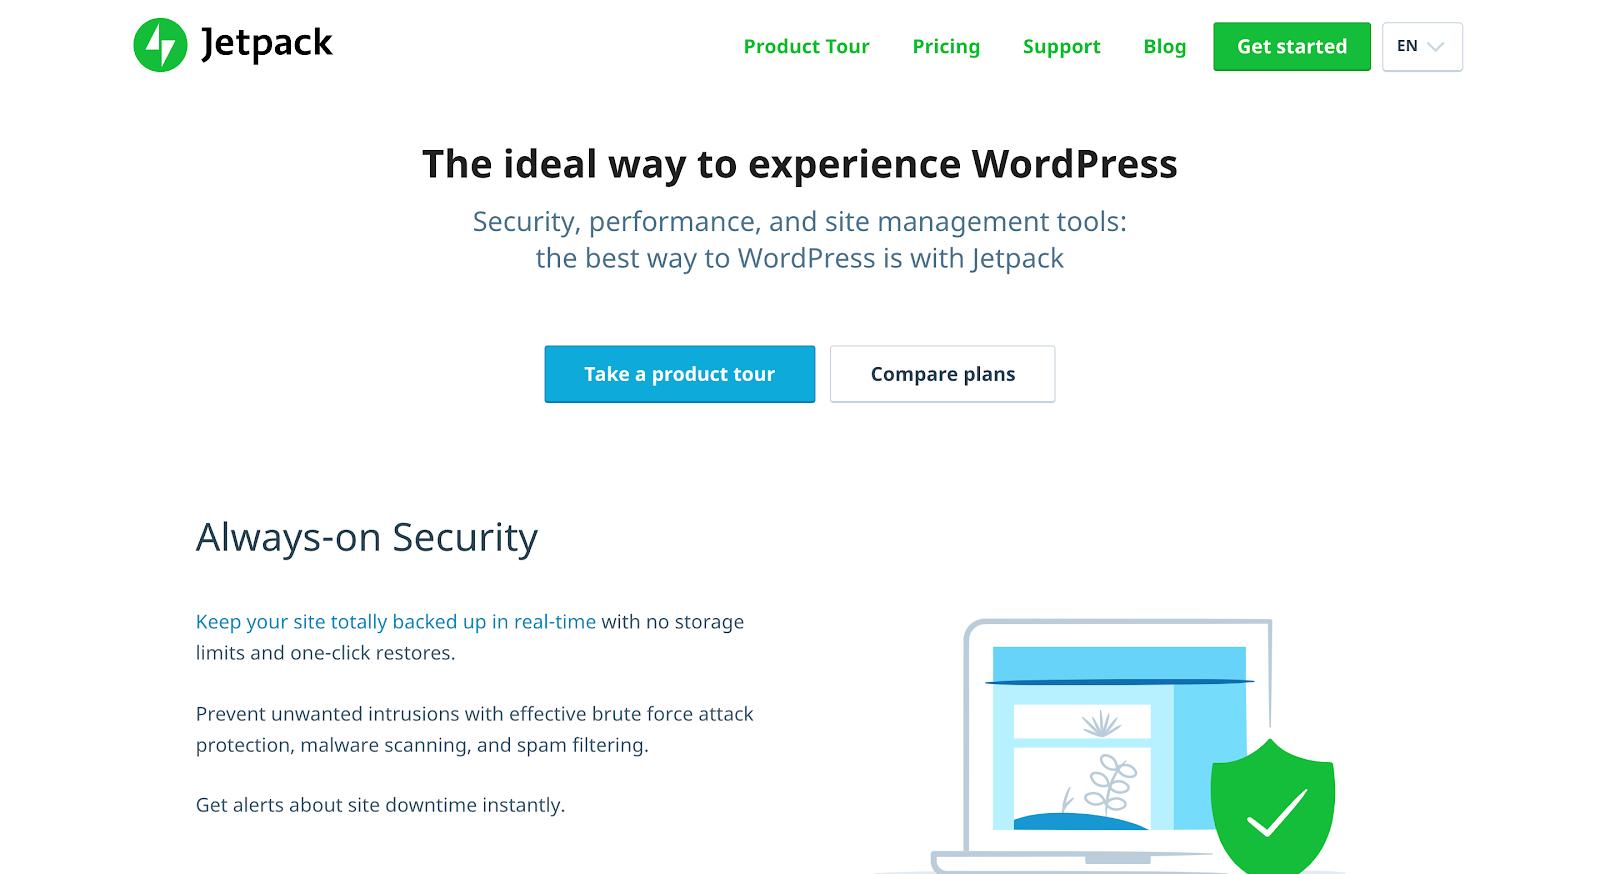 Jetpack video hosting